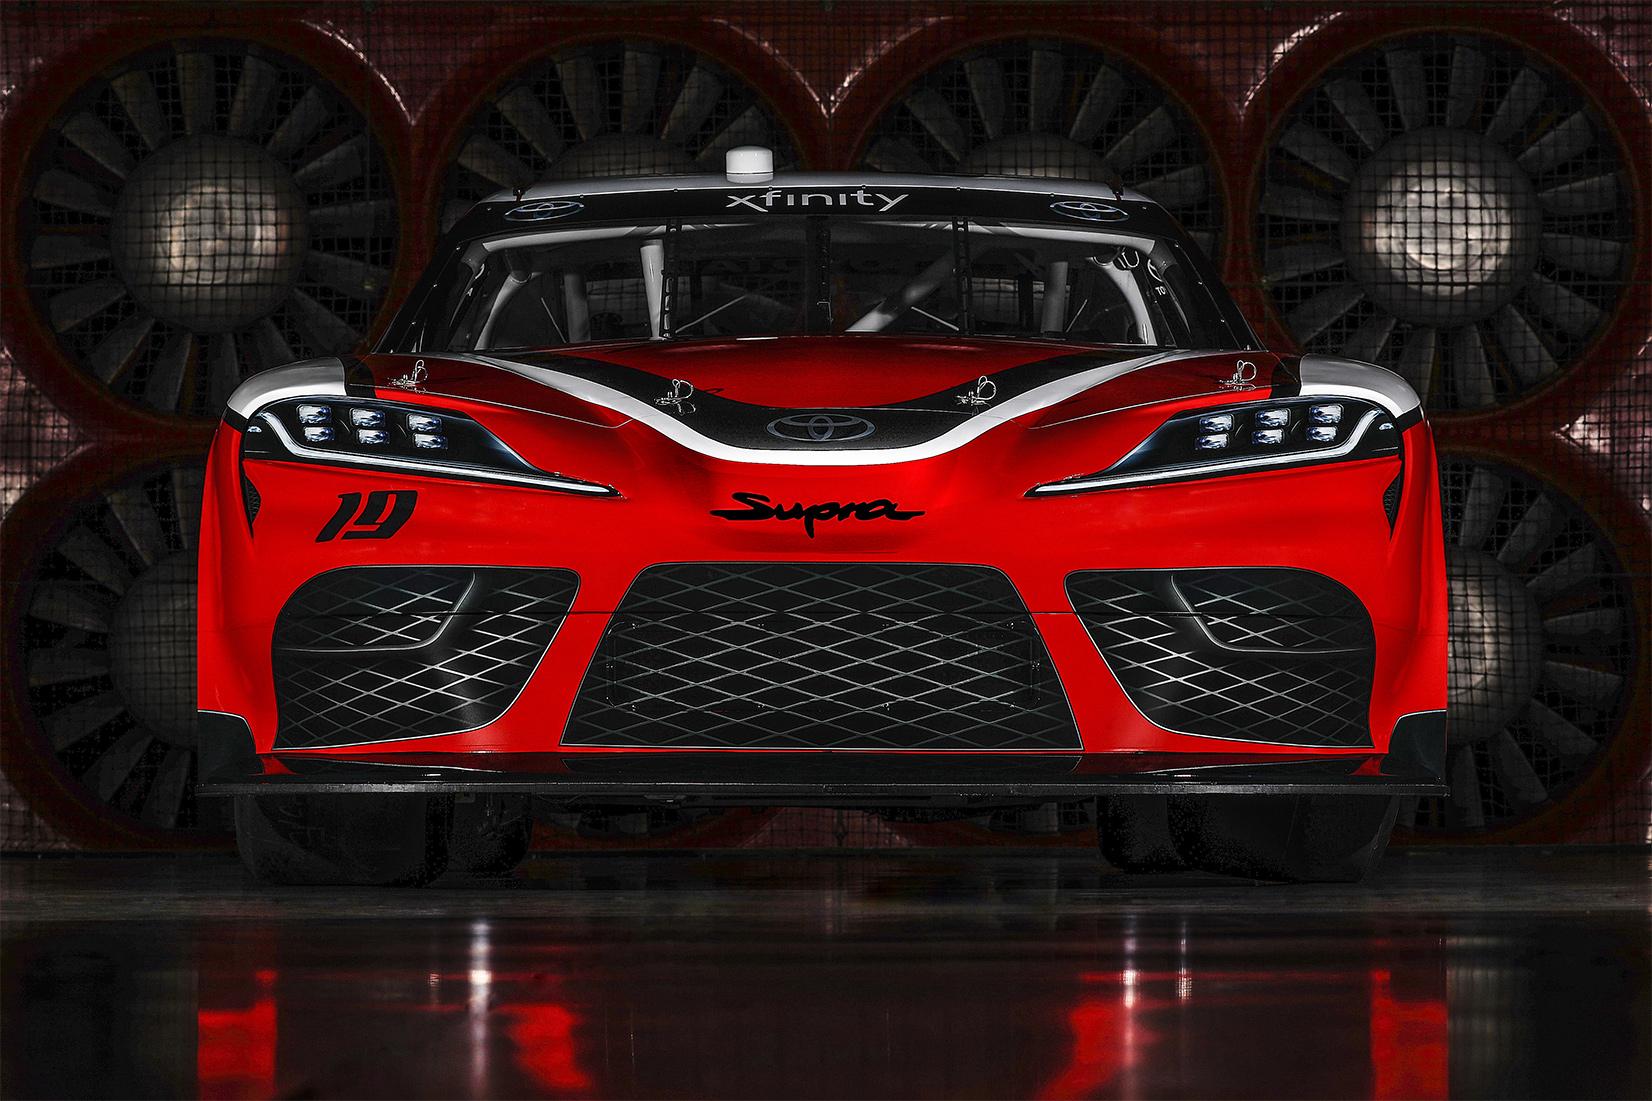 TrackWorthy - 2019 NASCAR Xfinity Series Toyota Supra (2)